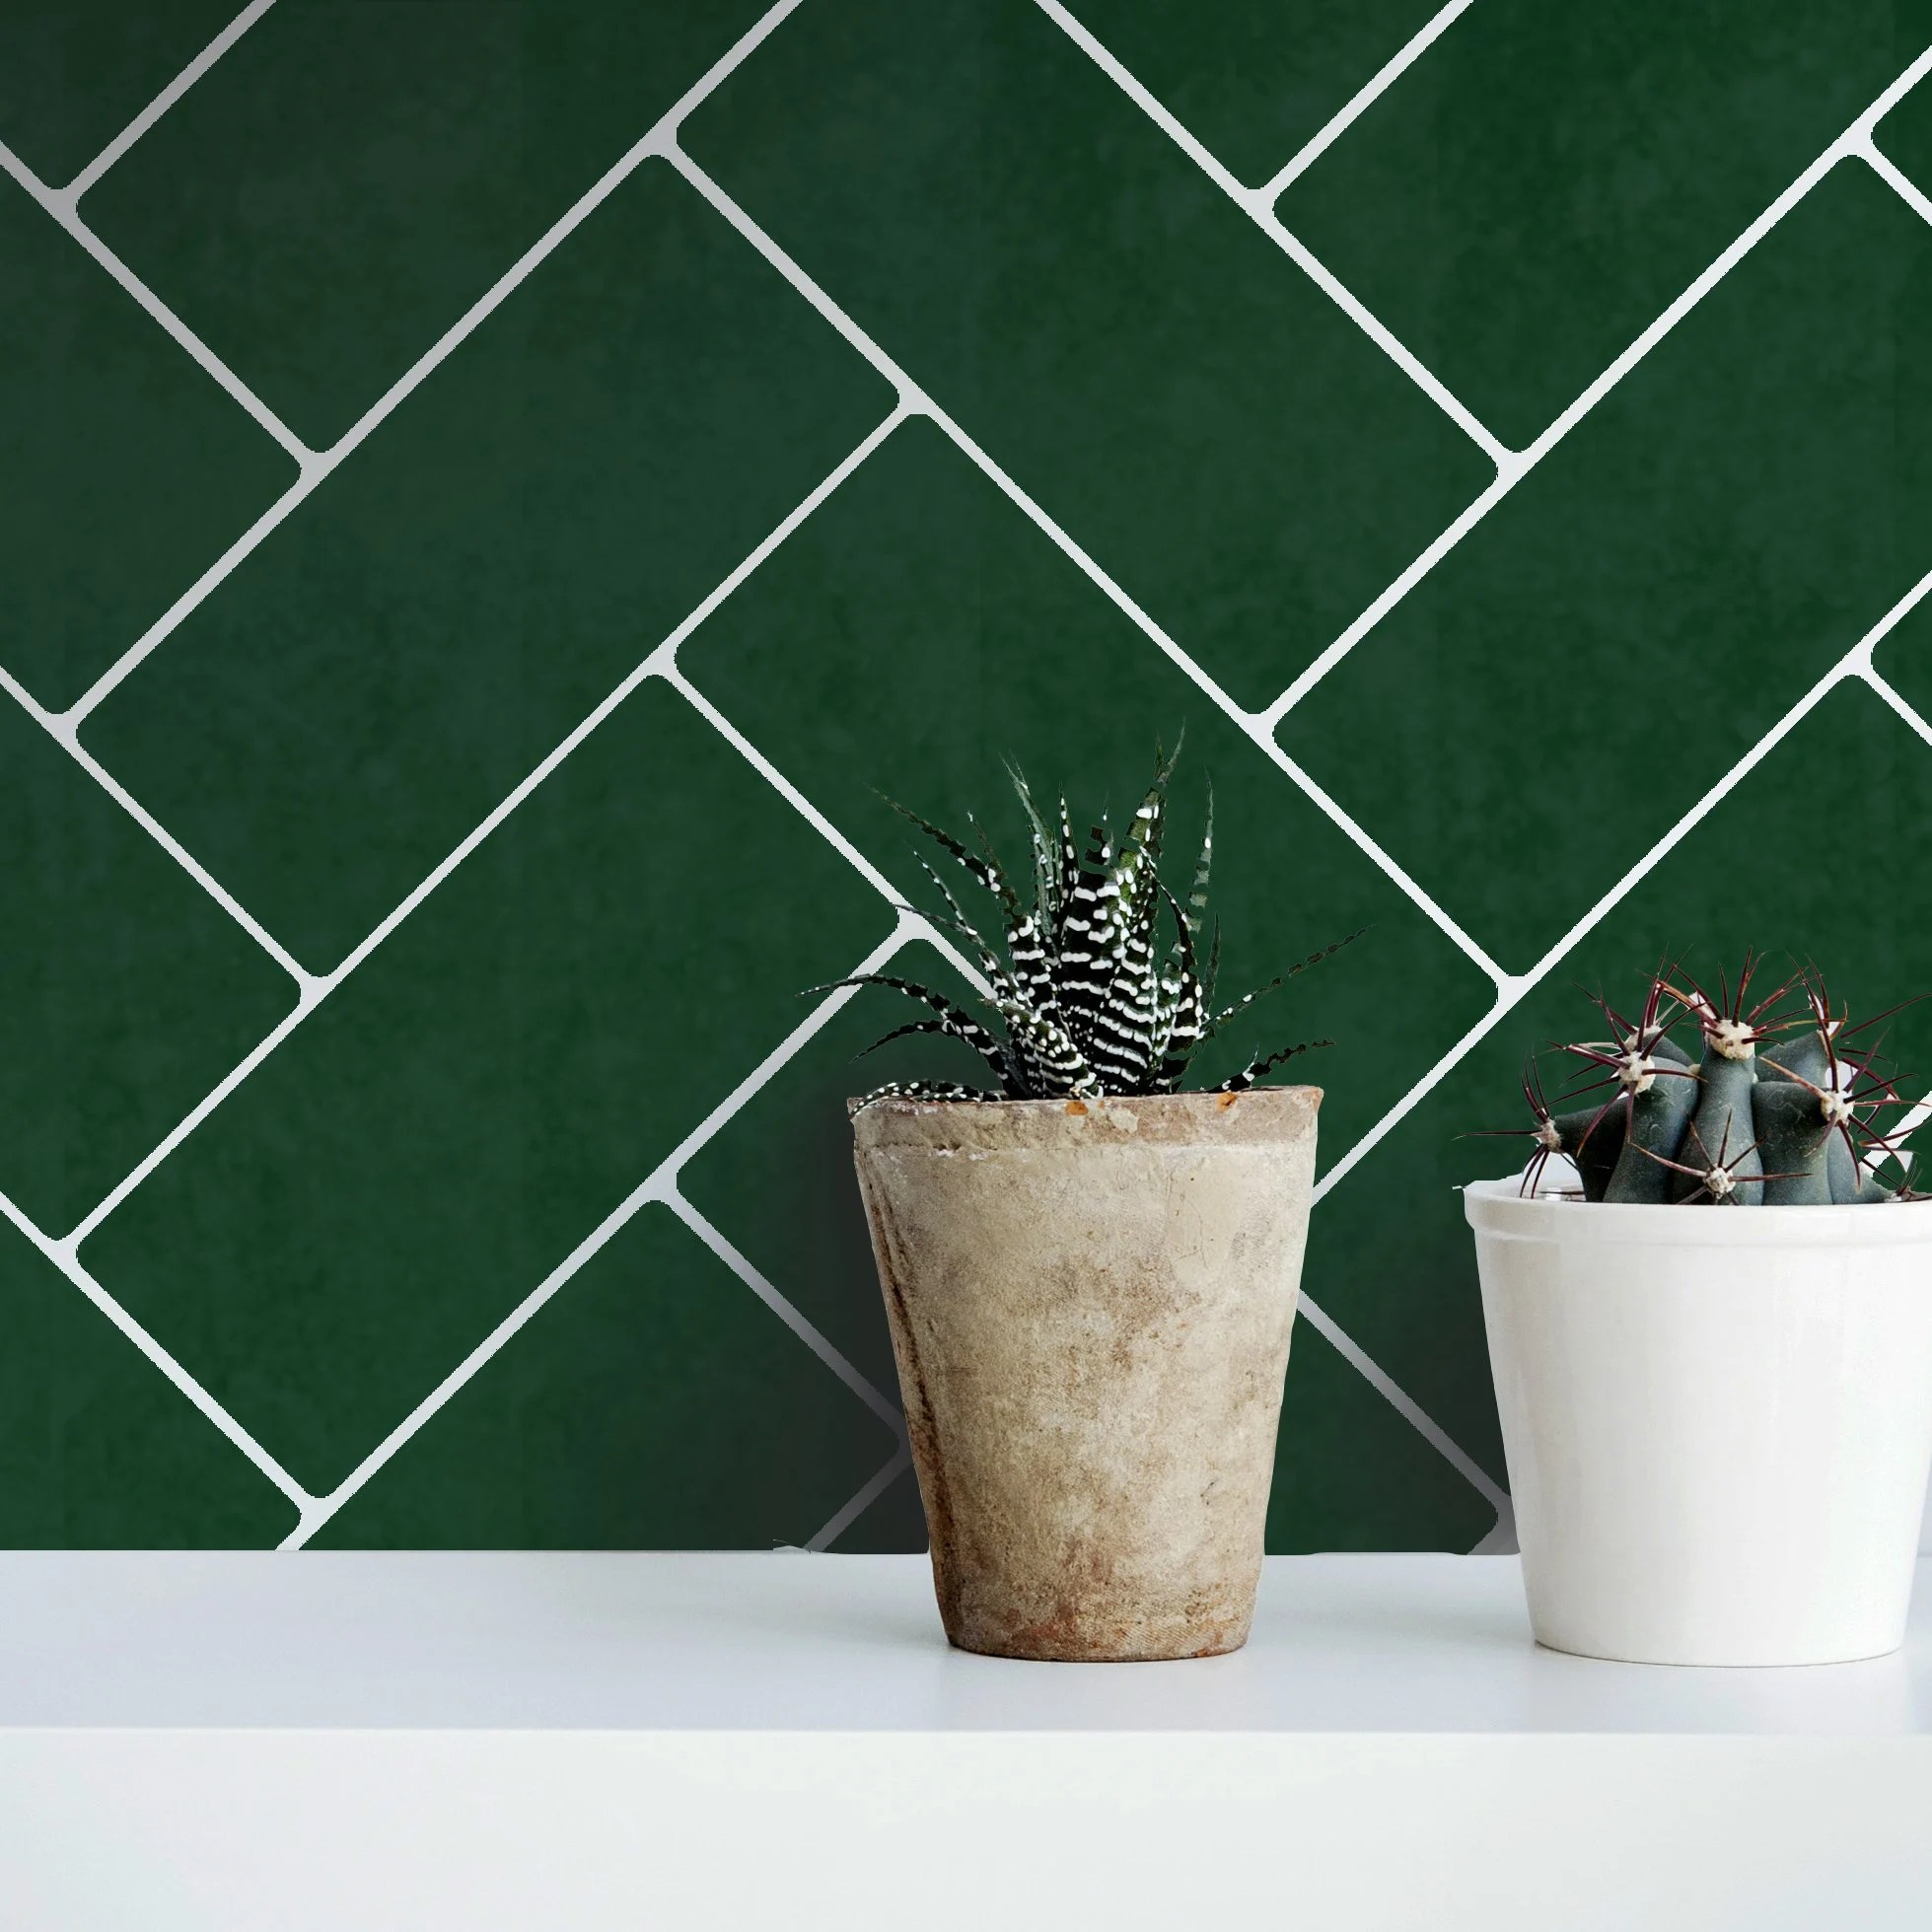 herringbone subway tile stencil for painting grout line stencil kitchen bathroom stencil modern geometric wall stencil